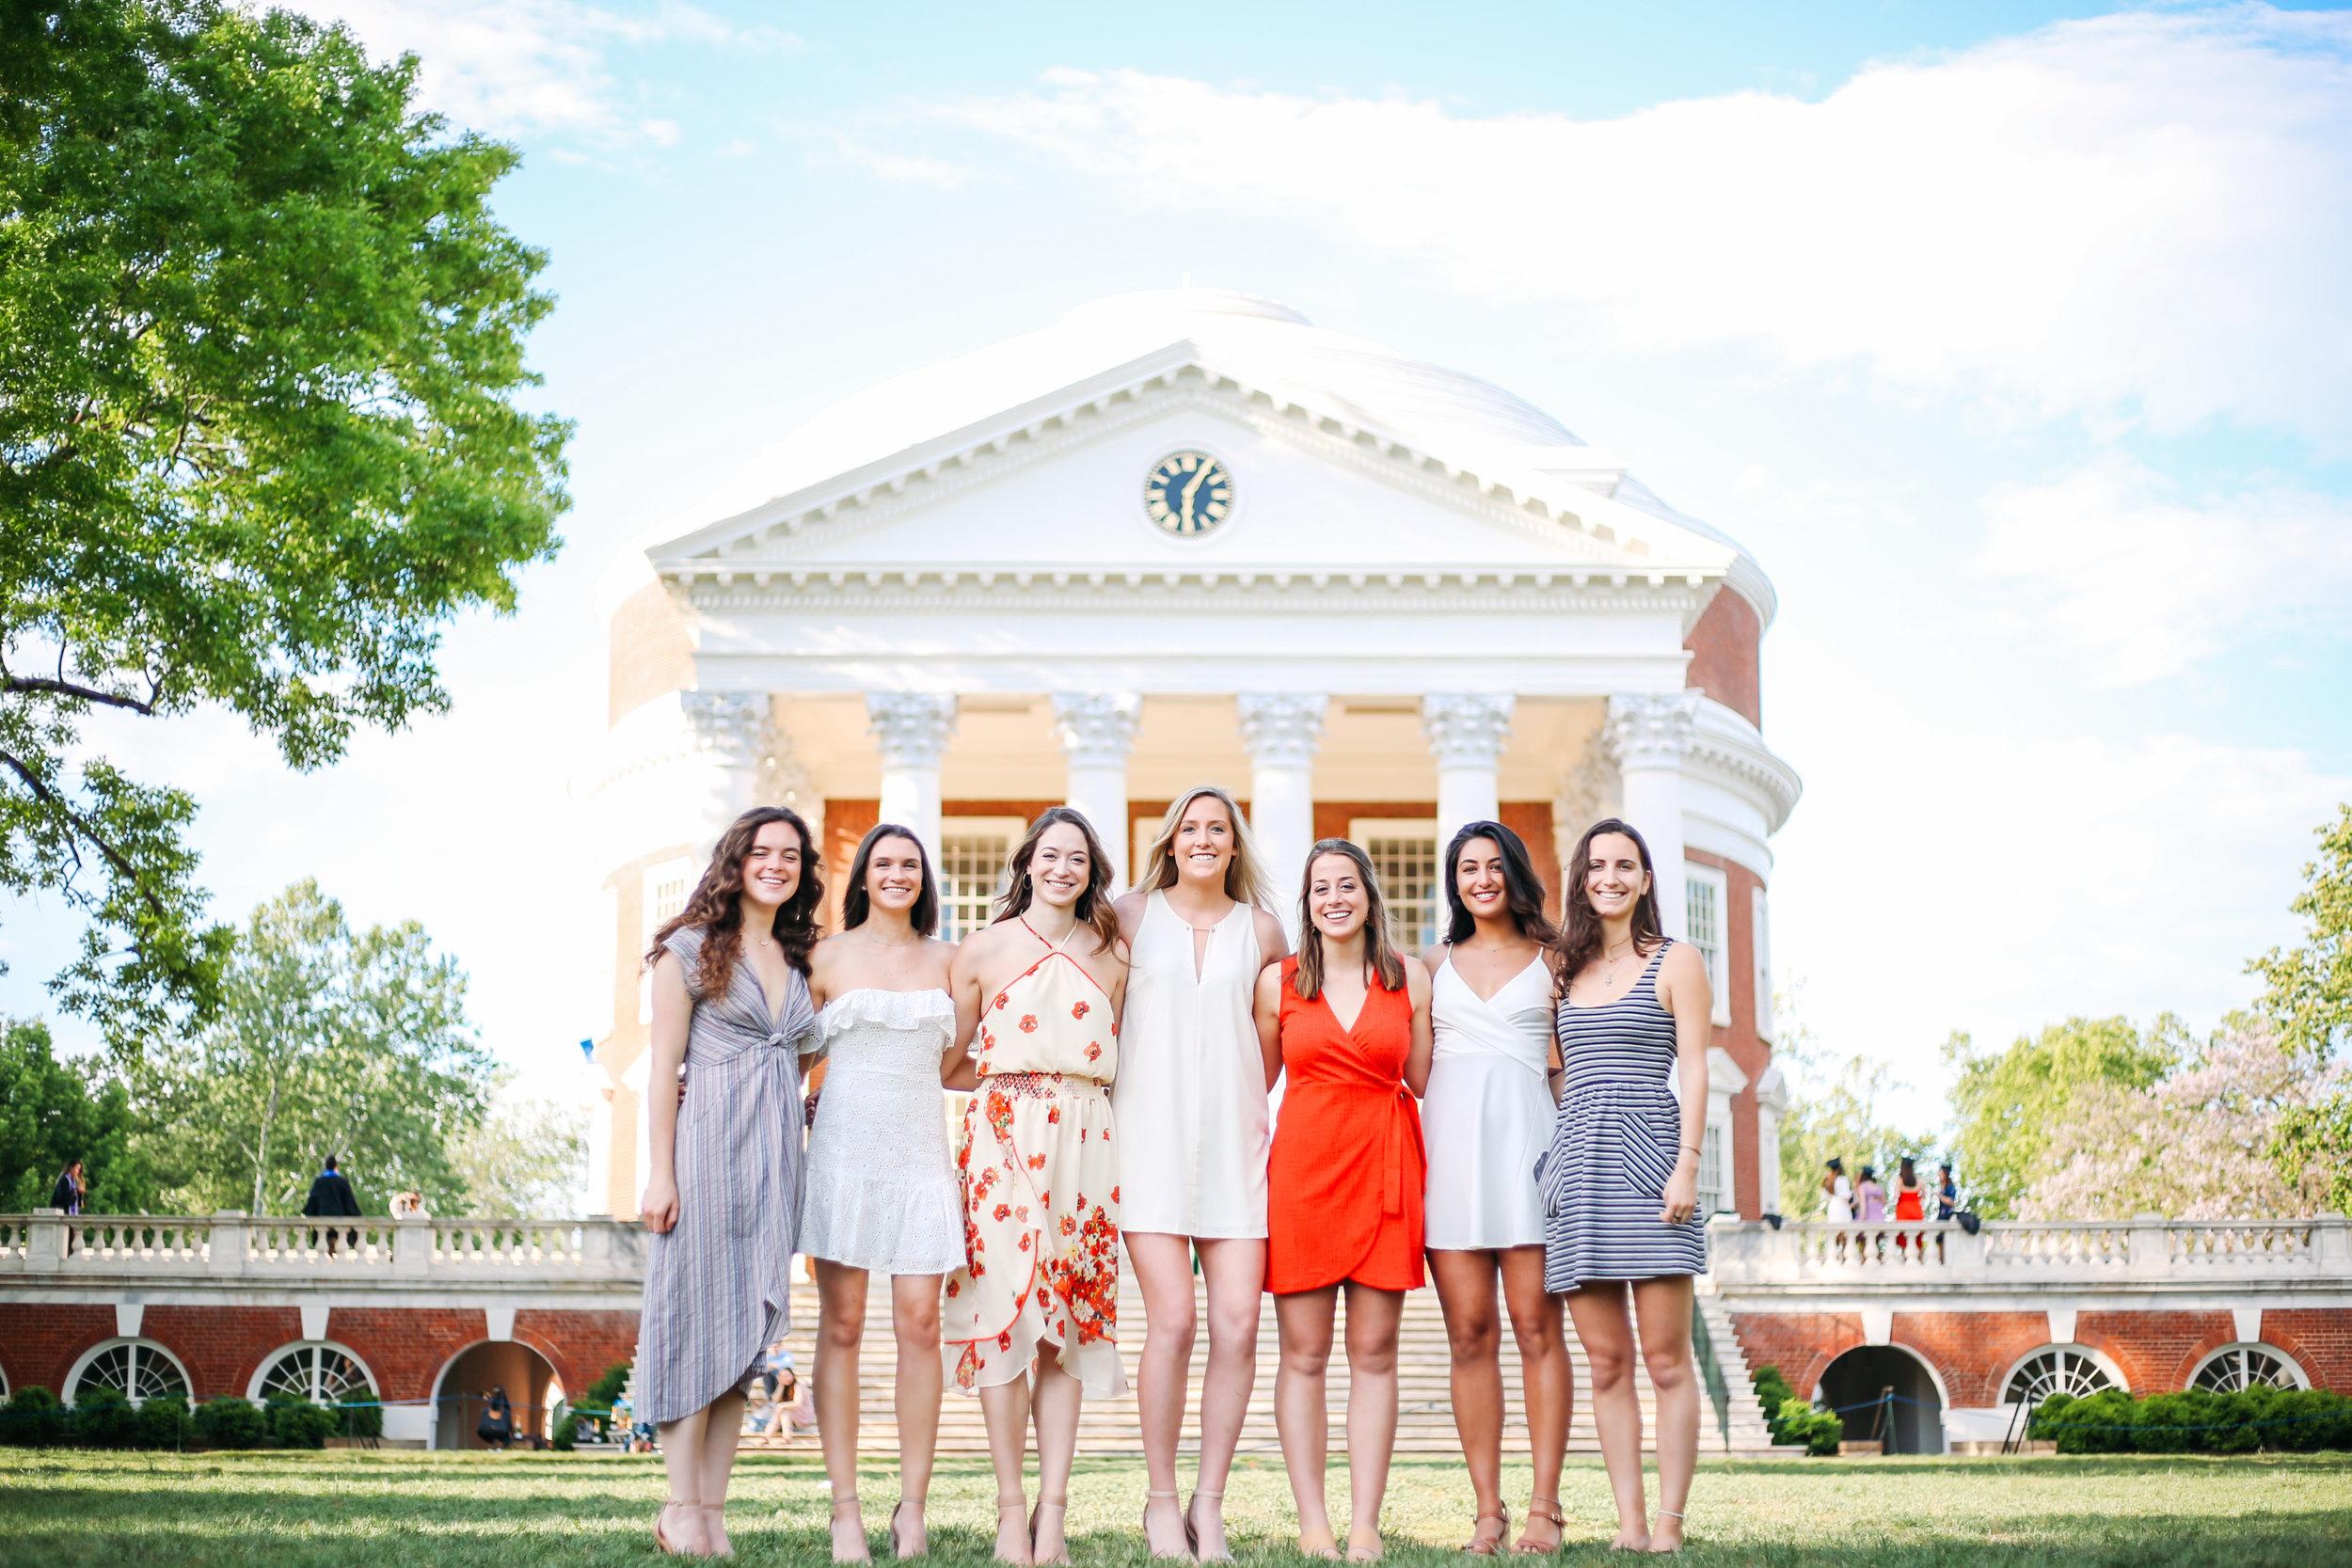 Neeka, Claire, Jessica, Ellie, Lauren F., & Lauren A.  Graduation Portraits.